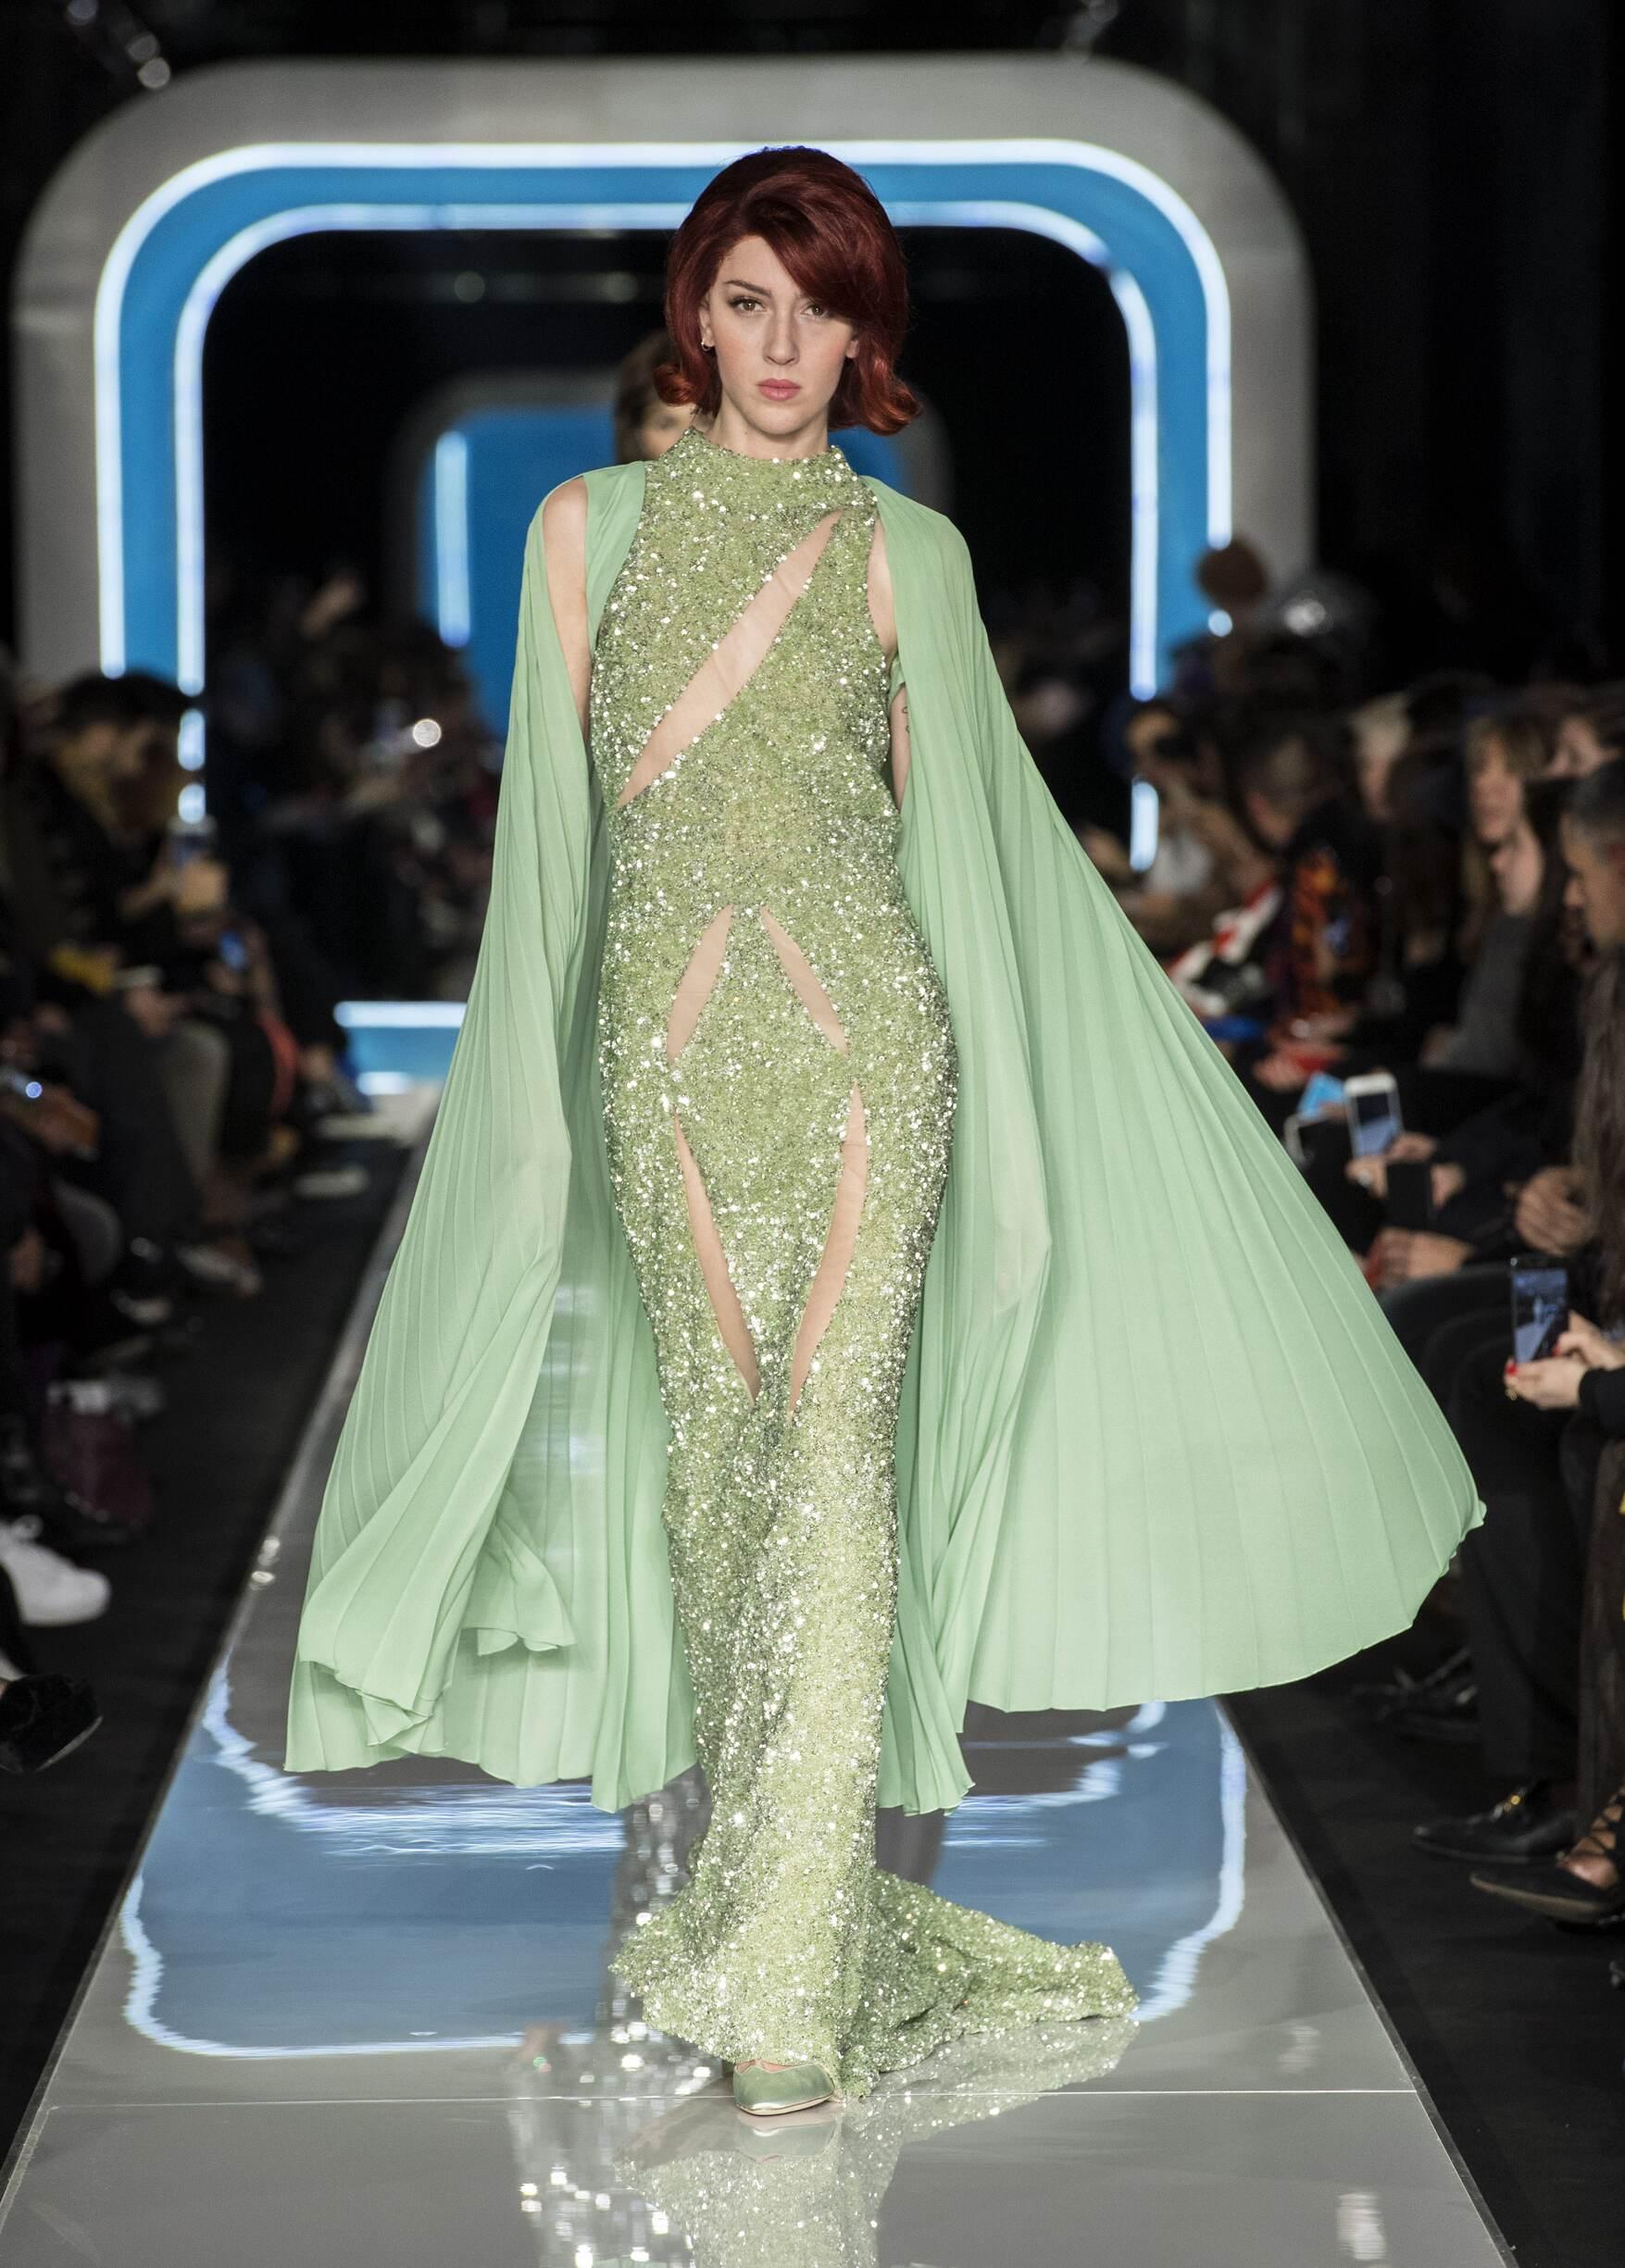 Woman FW 2018-19 Moschino Fashion Show Milan